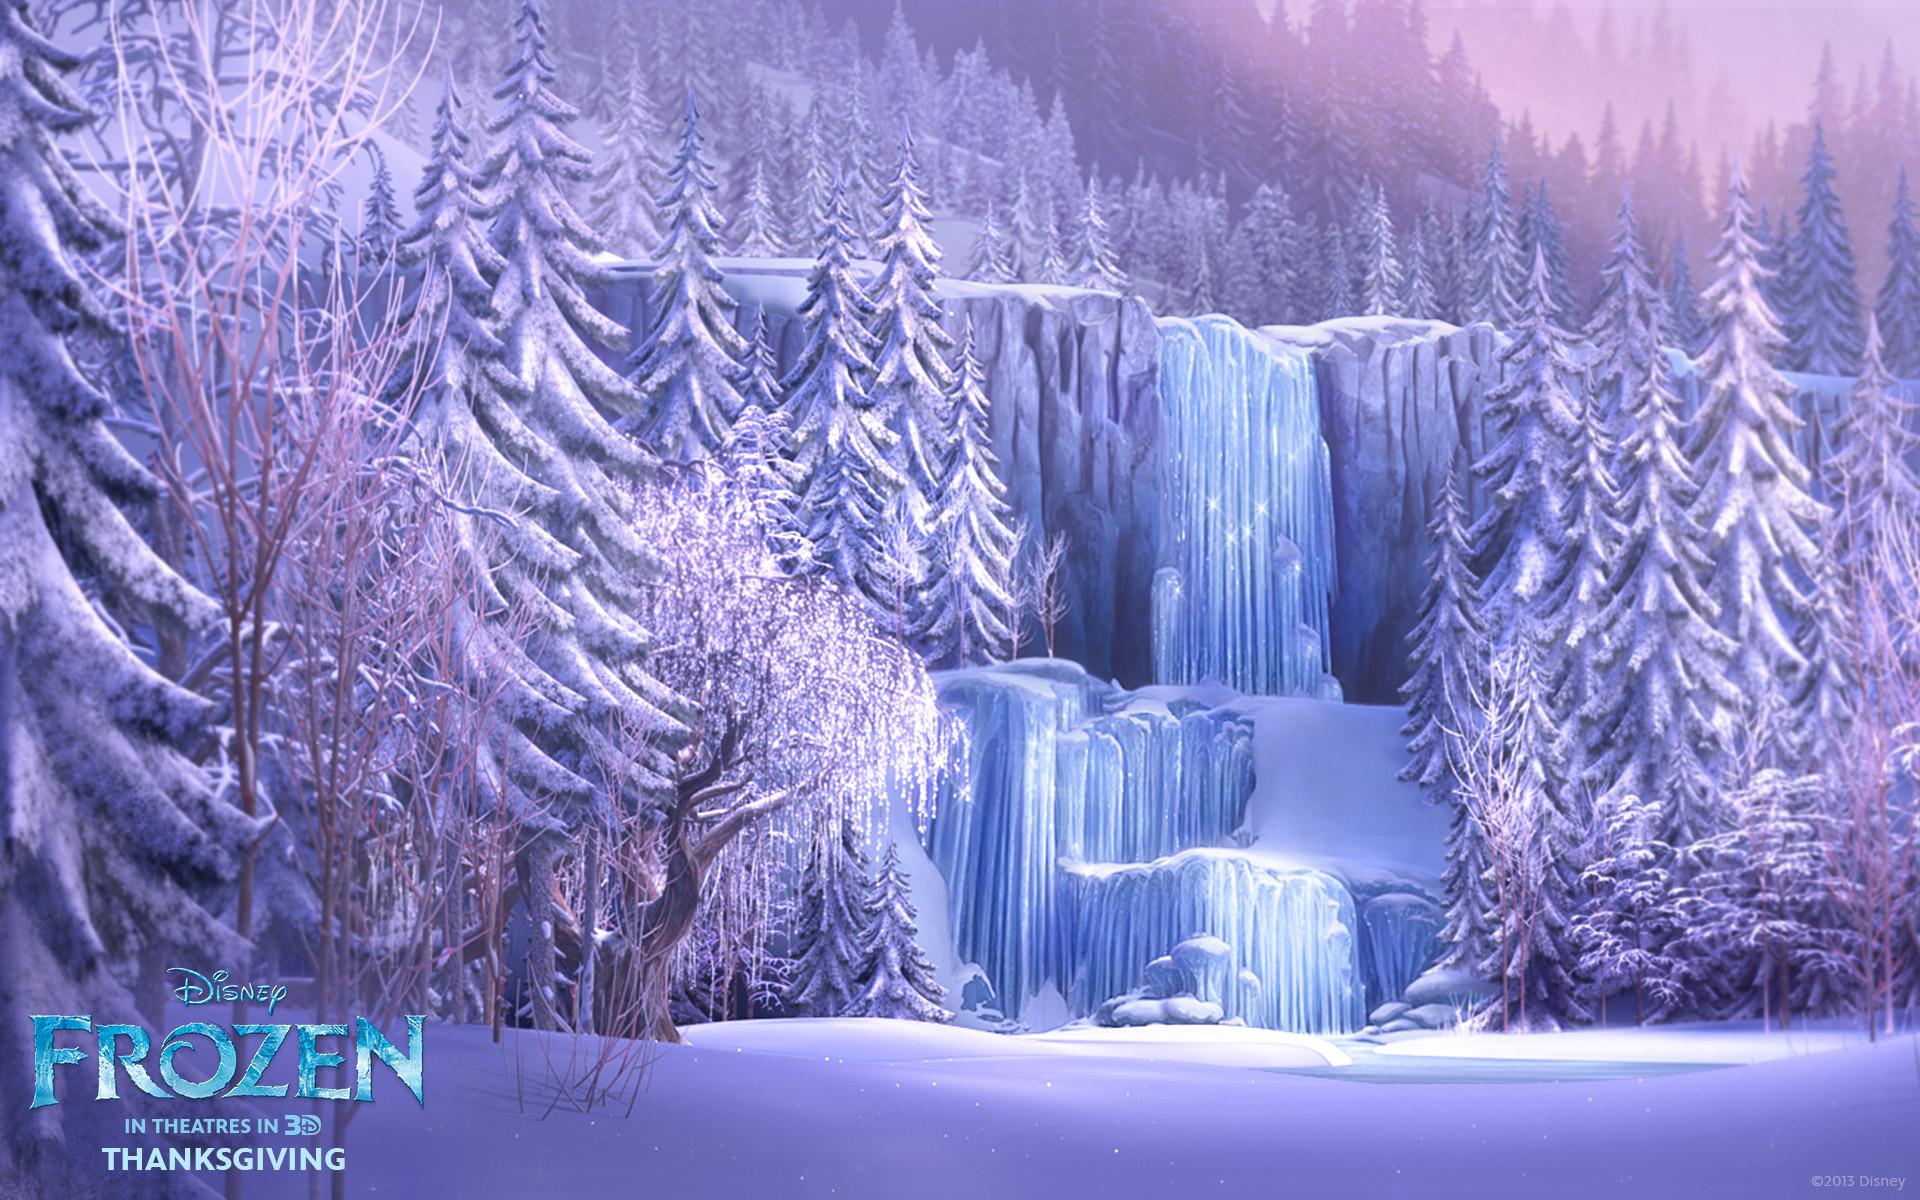 Frozen wallpaper   Click picture for high resolution HD wallpaper 1920x1200